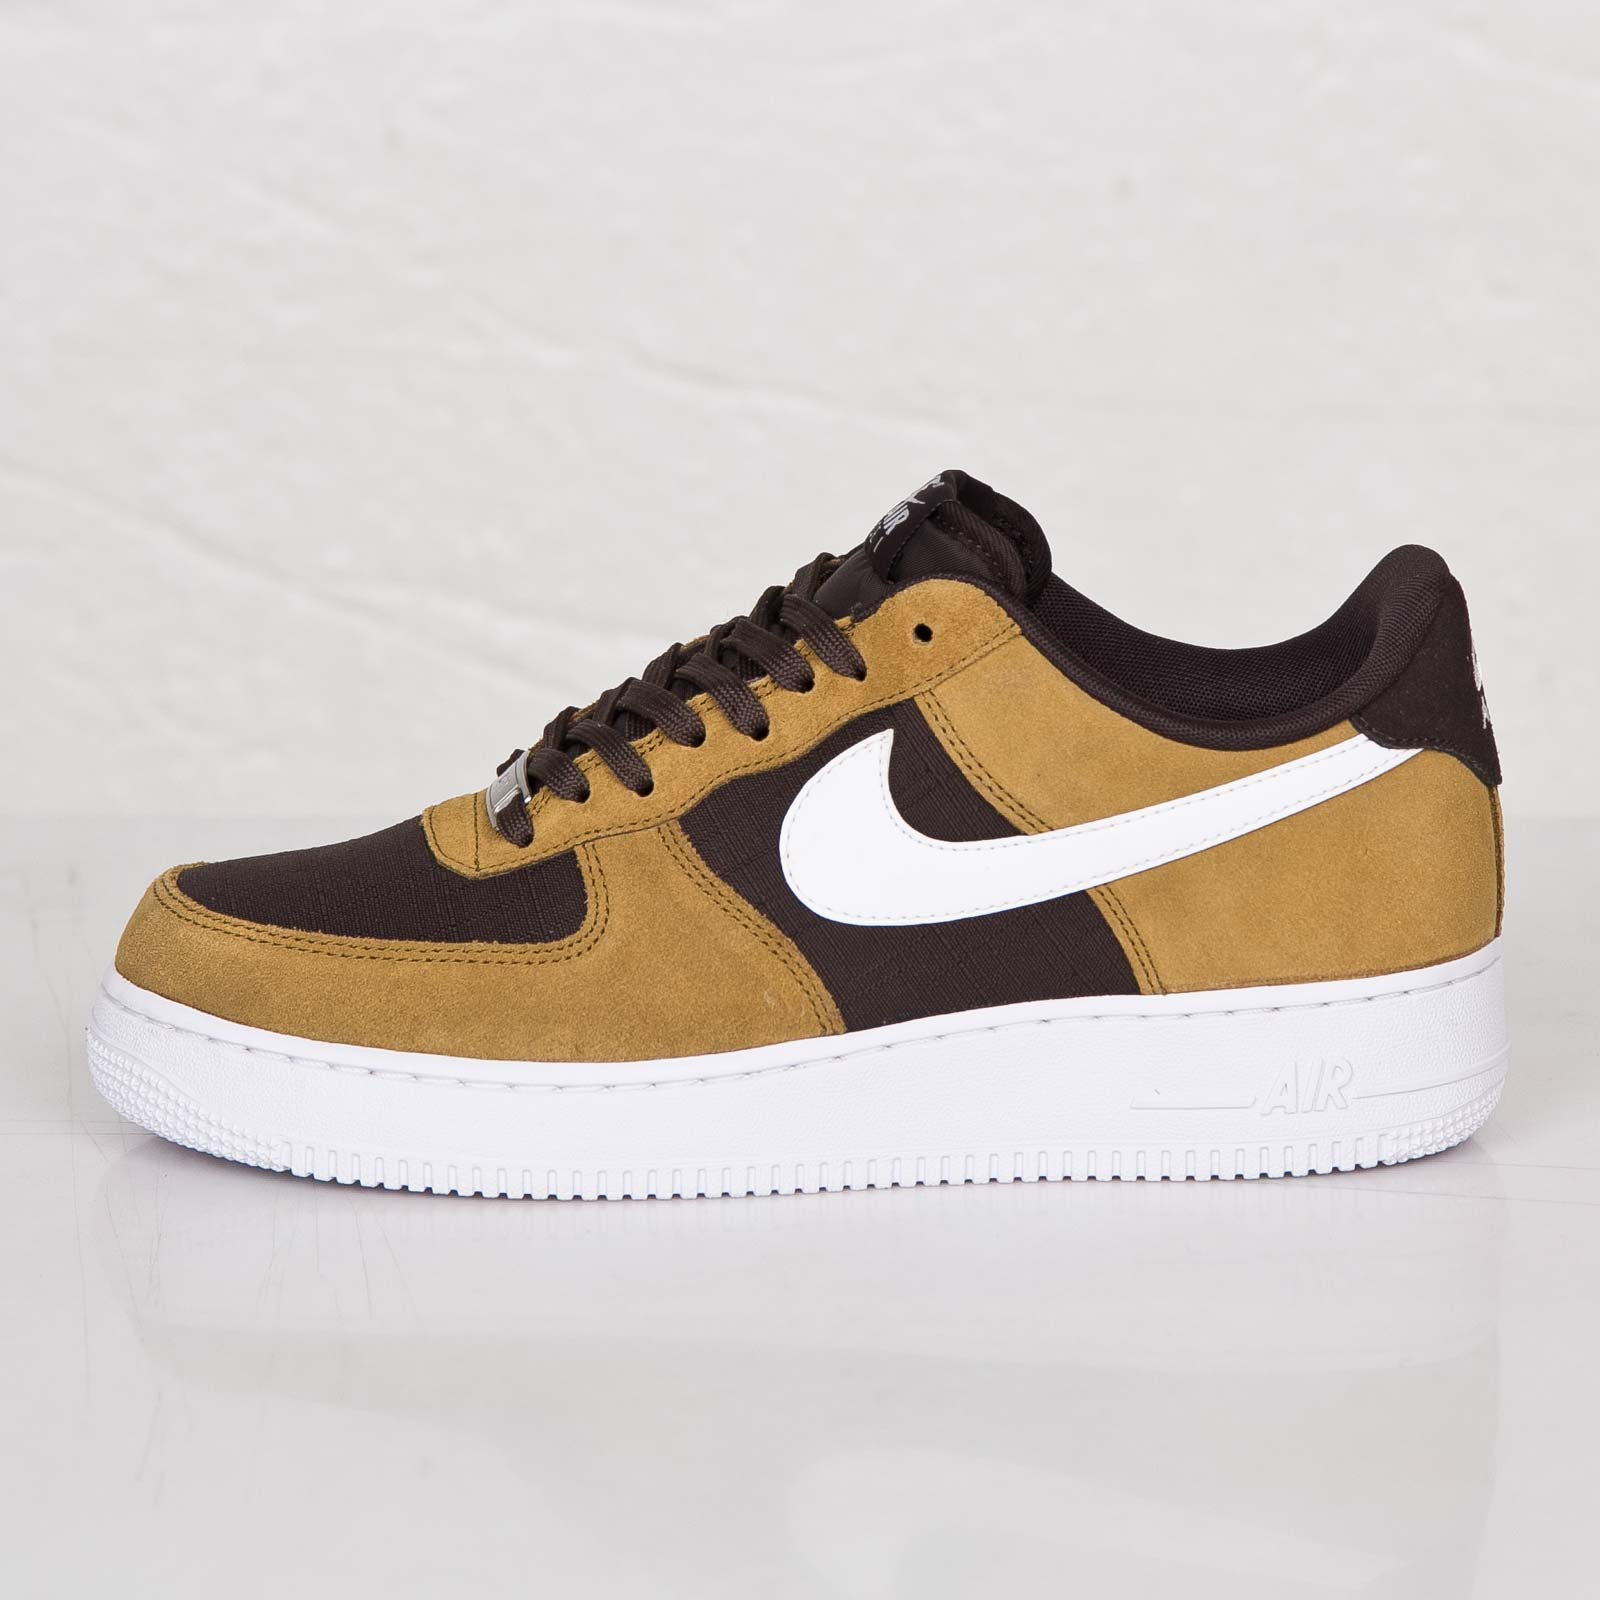 site réputé dadc2 4bb62 Nike Air Force 1 - 488298-207 - Sneakersnstuff | sneakers ...